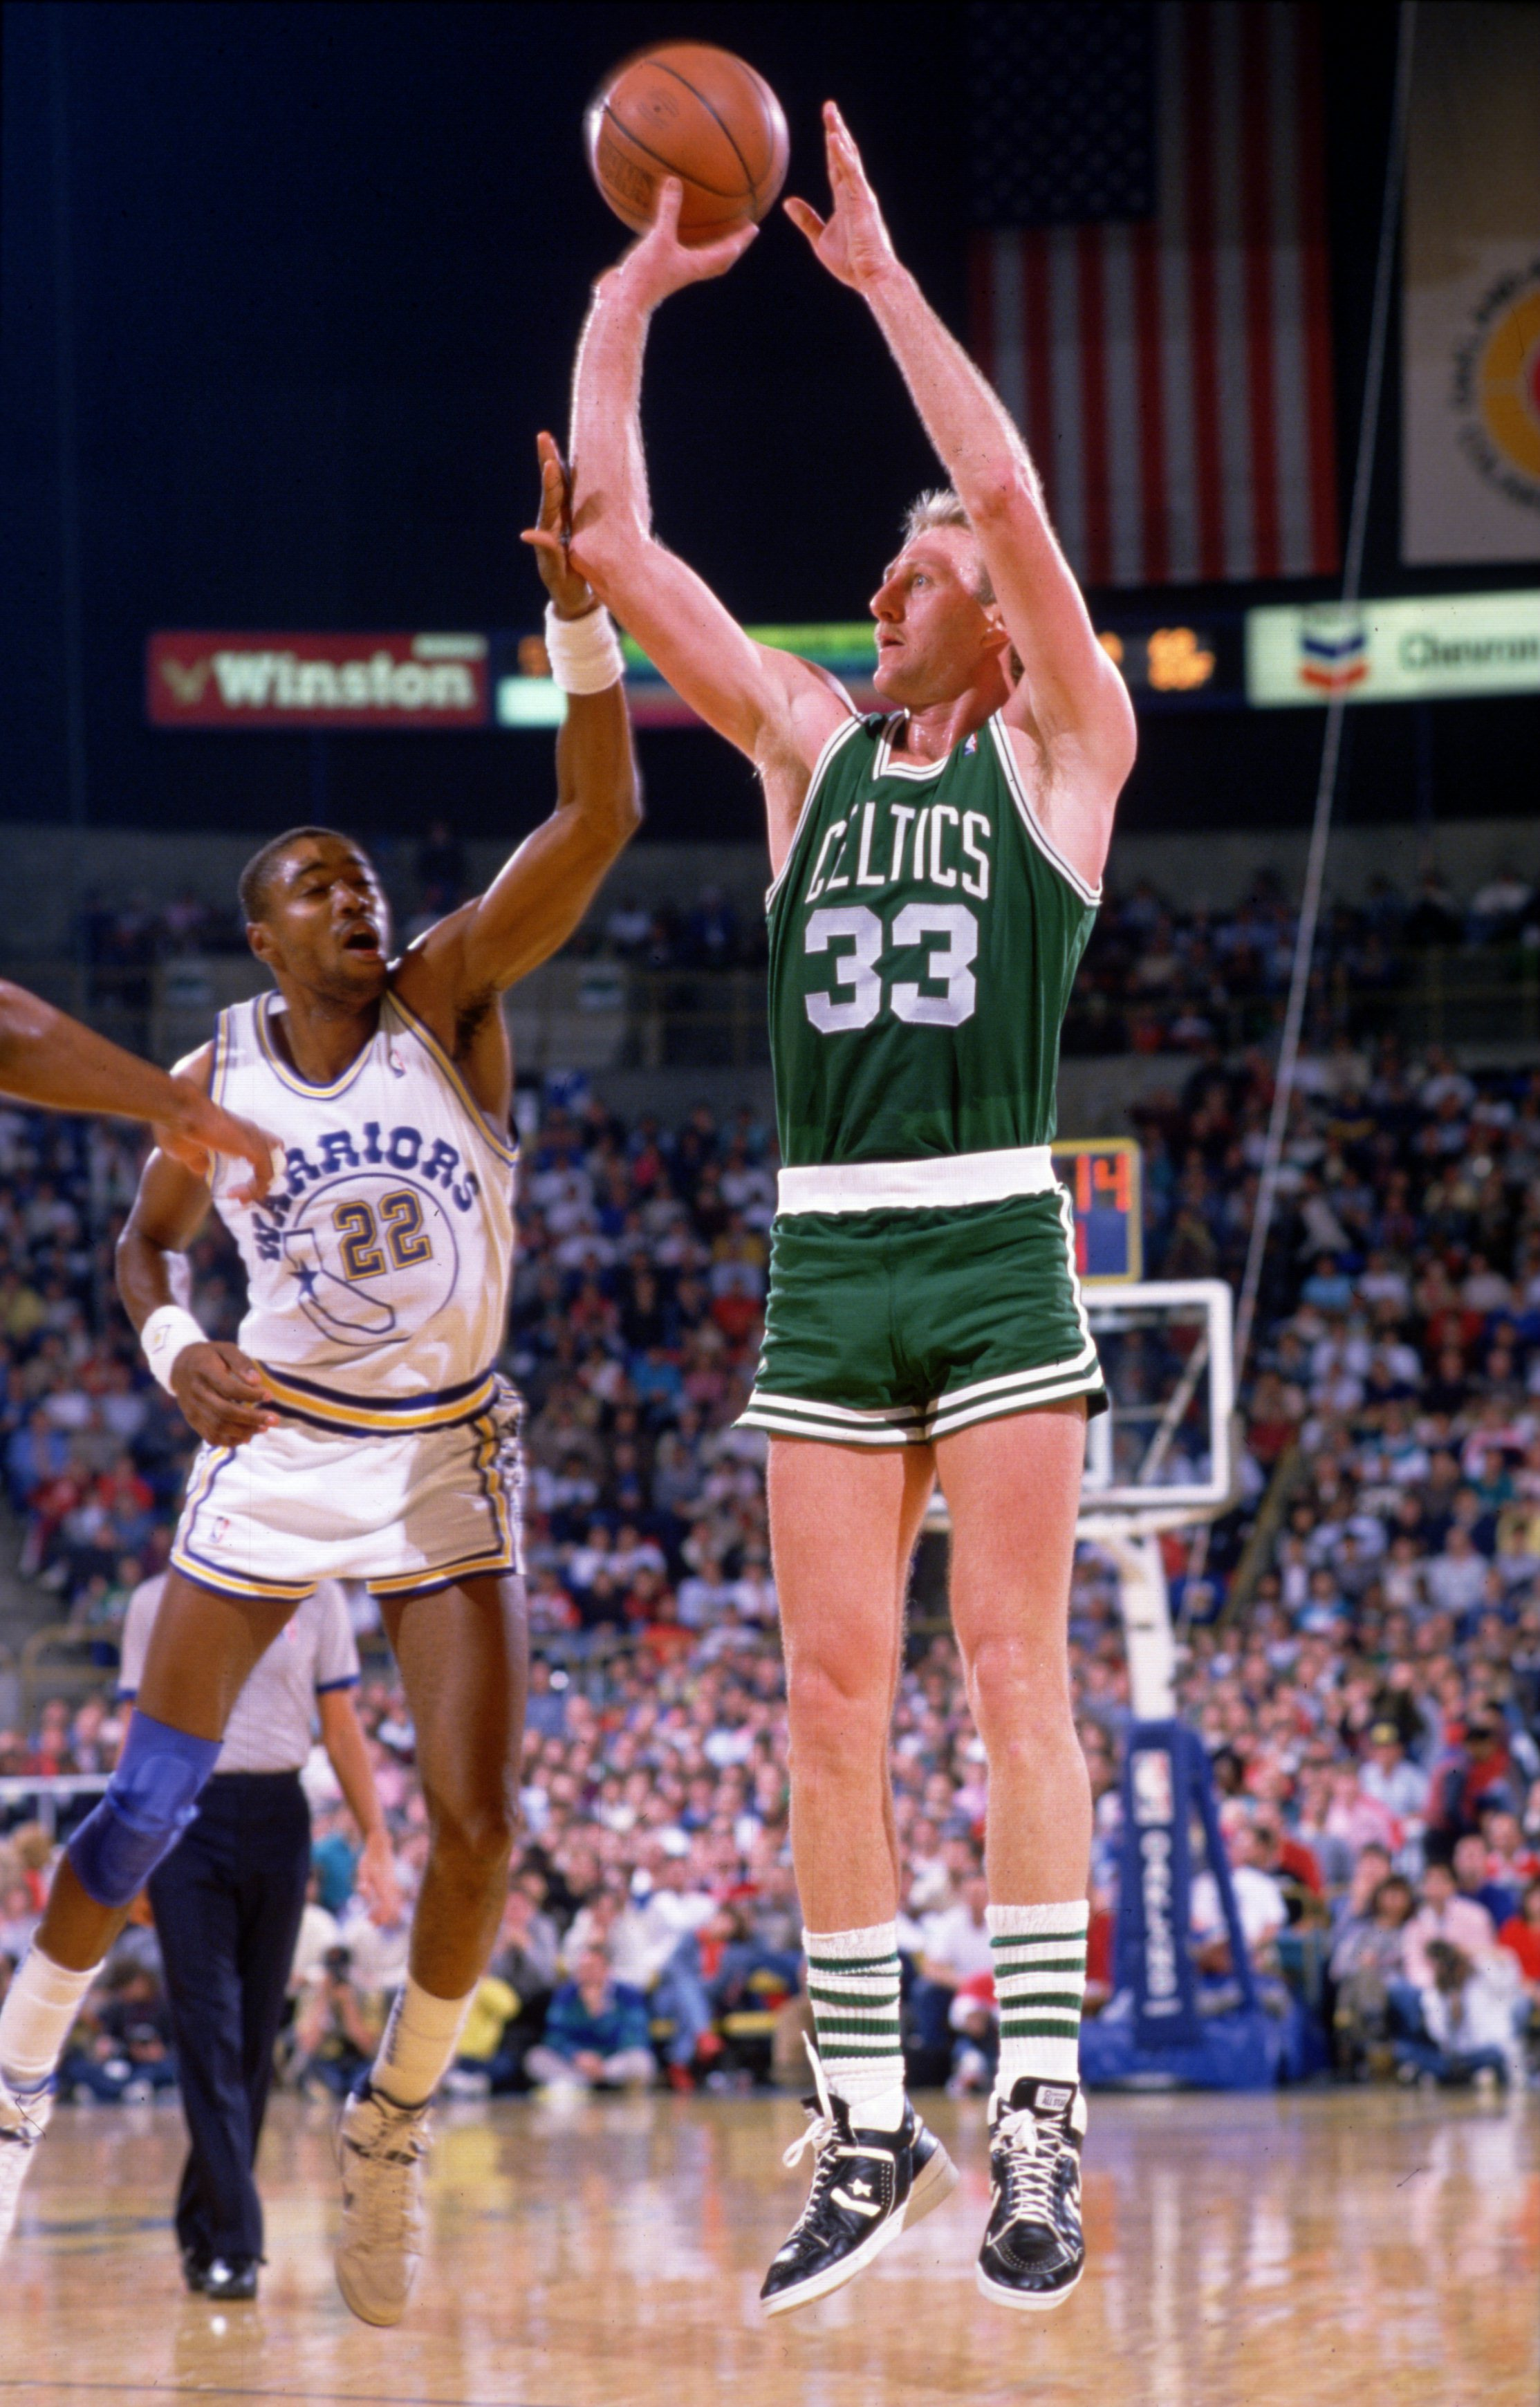 Top 25 Players In Boston Celtics History: Where Does Paul Pierce Rank? | Bleacher Report ...